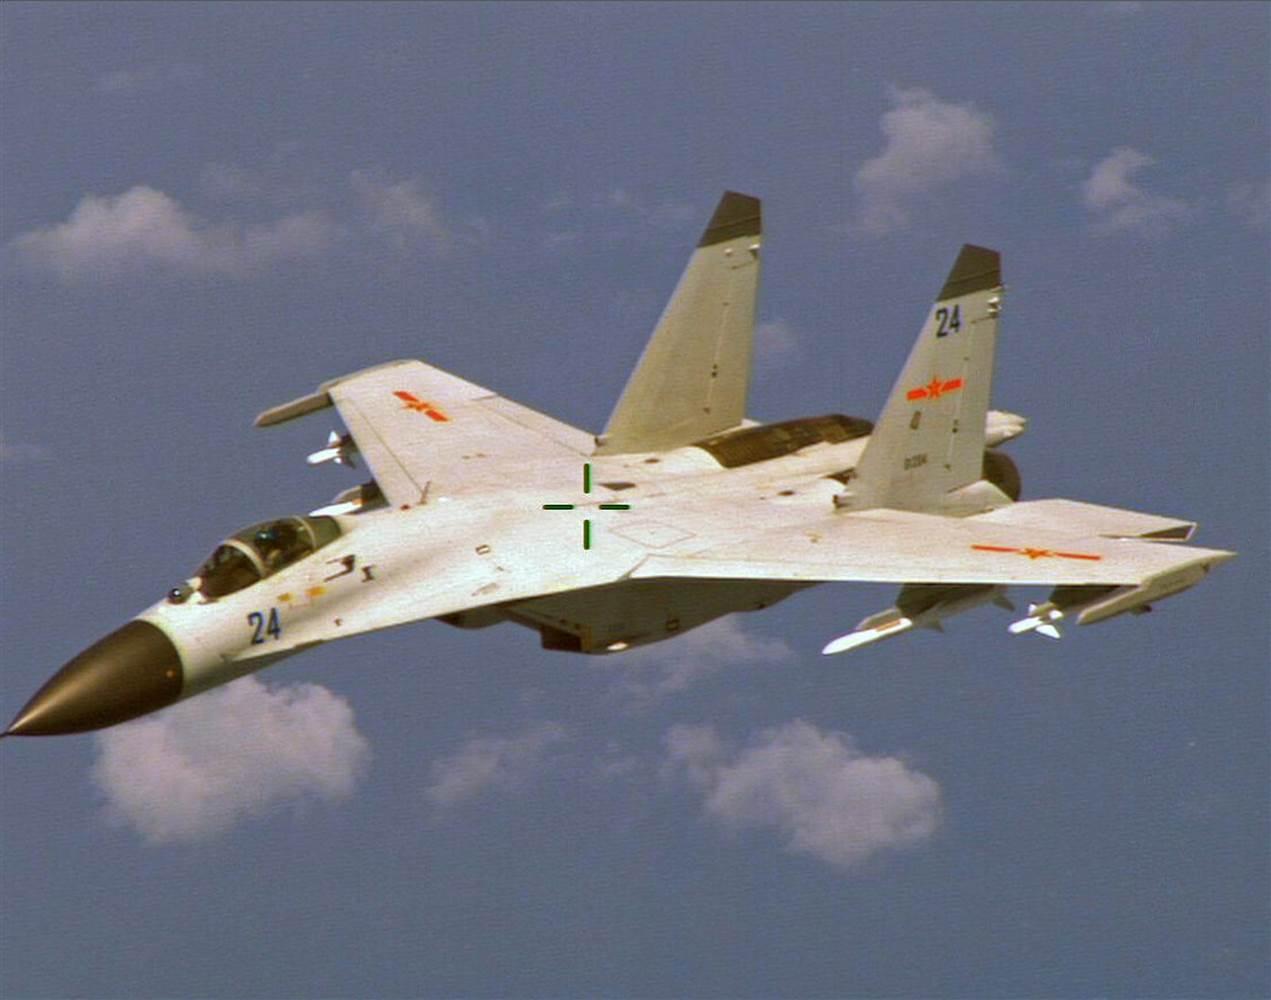 Chinese Jets Intercept U.S. Spy Plane Over South China Sea